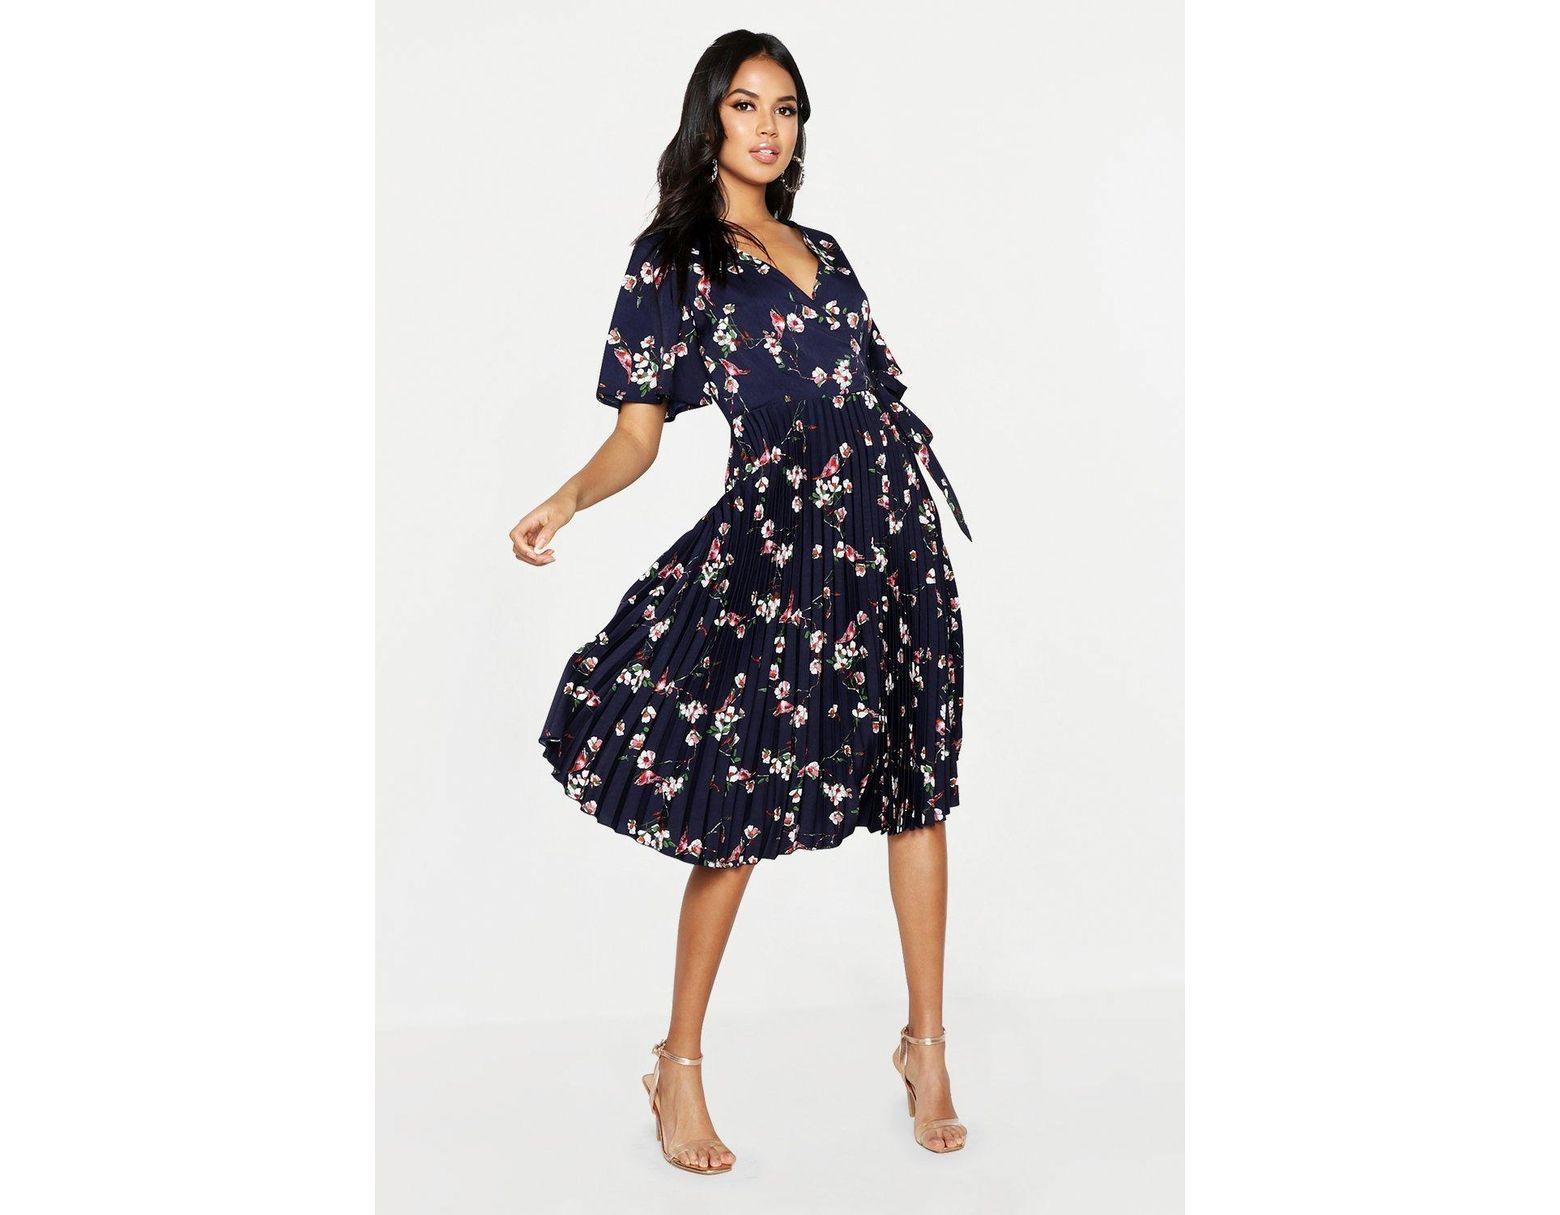 25921c141ede Lyst - Boohoo Floral Print Pleated Midi Skater Dress in Blue